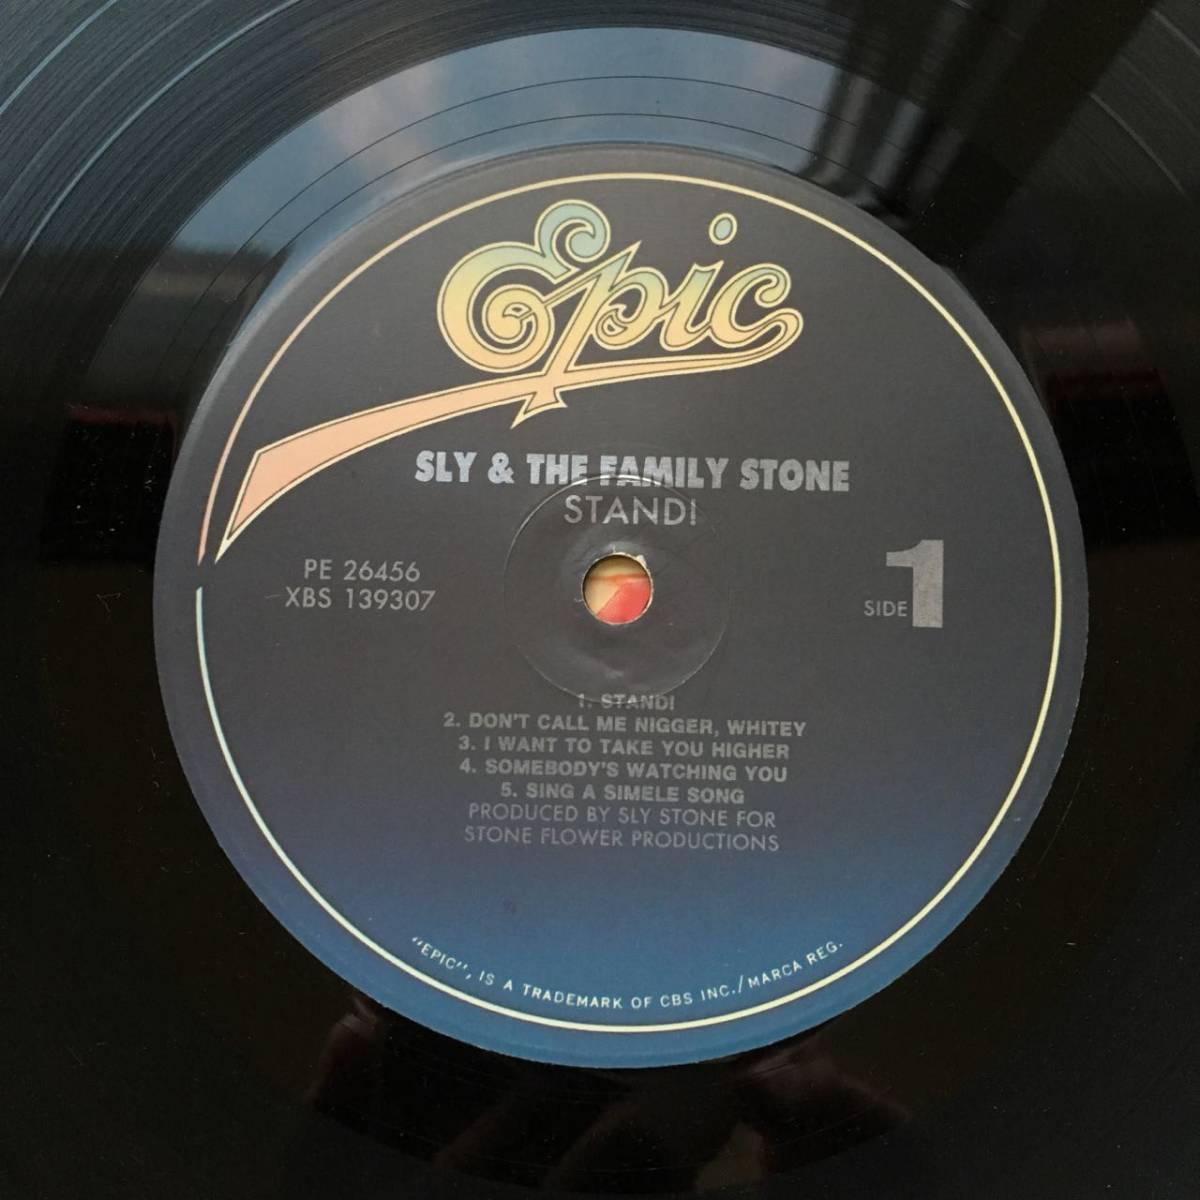 【LP・米盤/EPIC PE-26456】SLY & THE FAMILY STONE(スライ&ザ ファミリーストーン)/ STAND(スタンド)_画像3